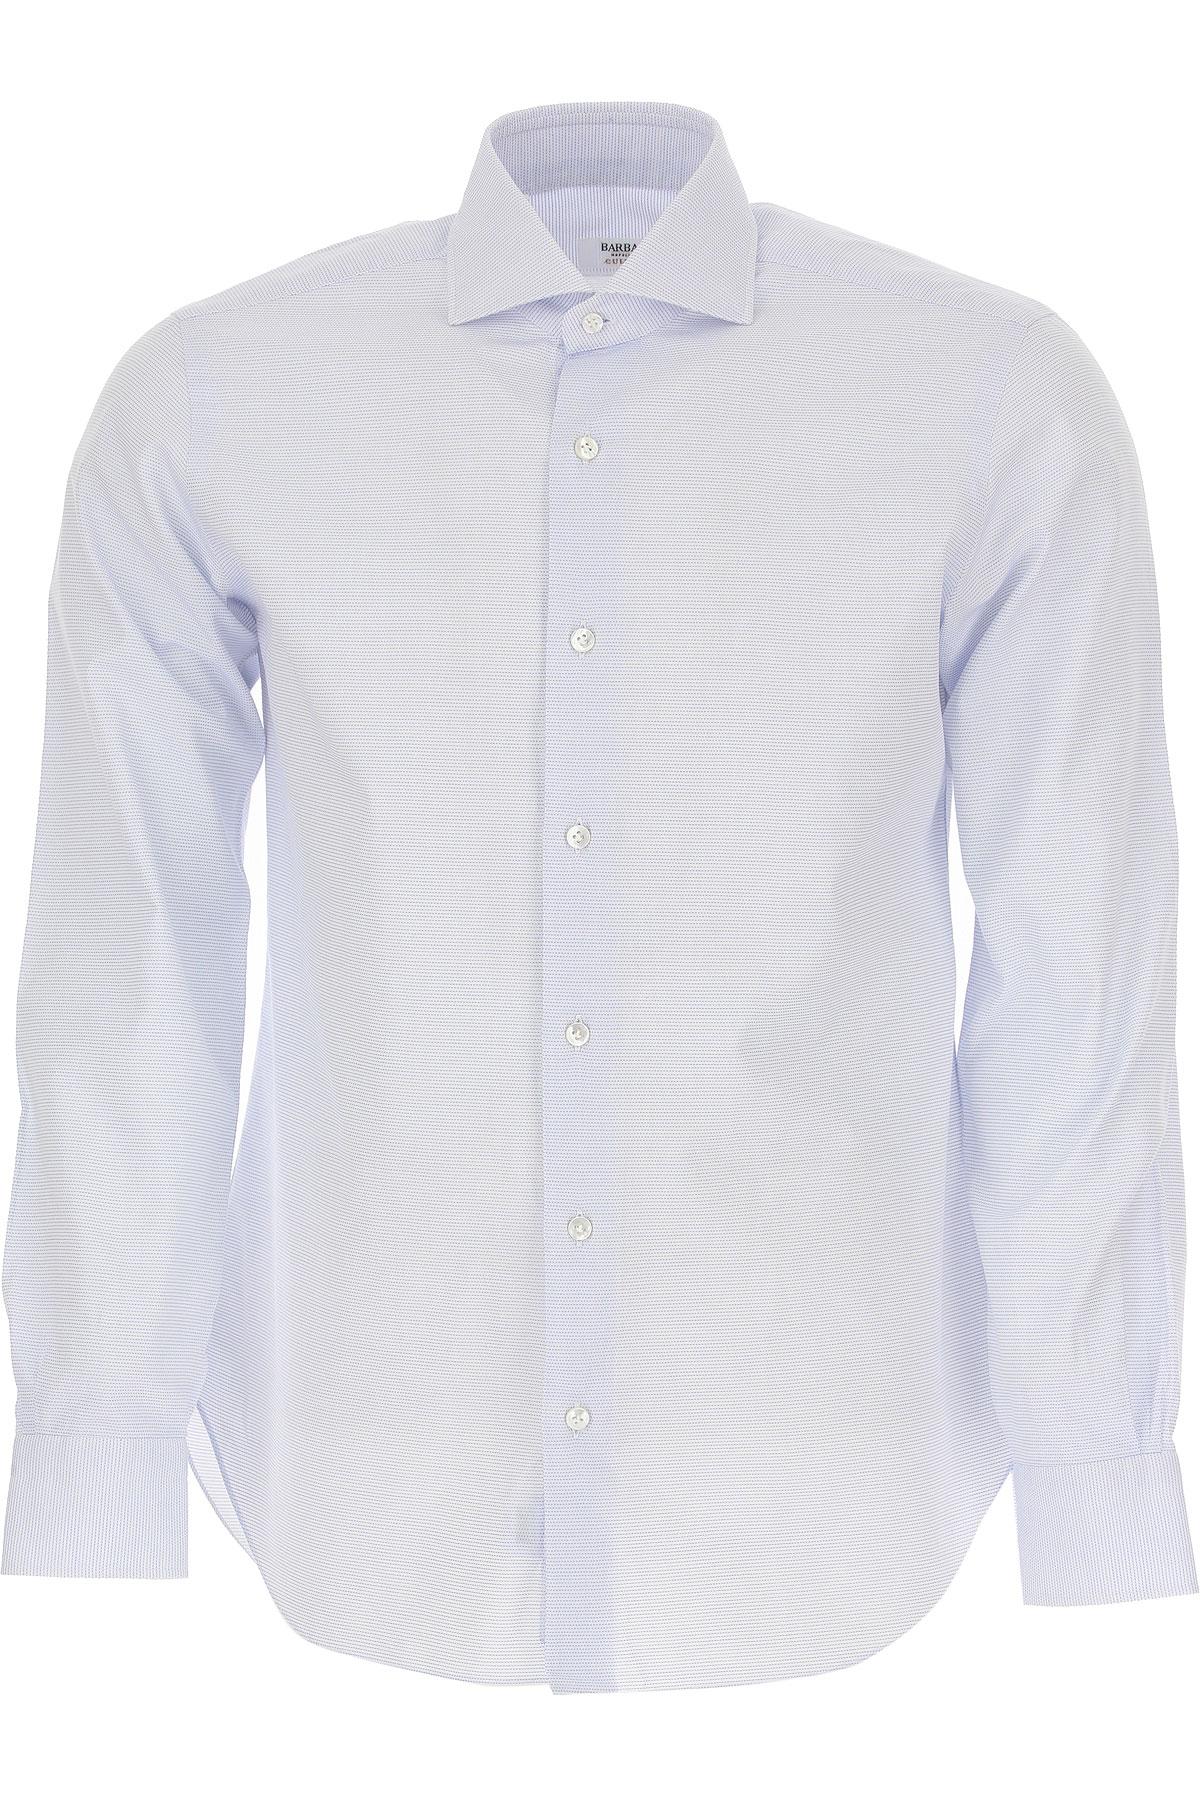 Barba Shirt for Men On Sale, White, Cotton, 2019, 15.75 16.5